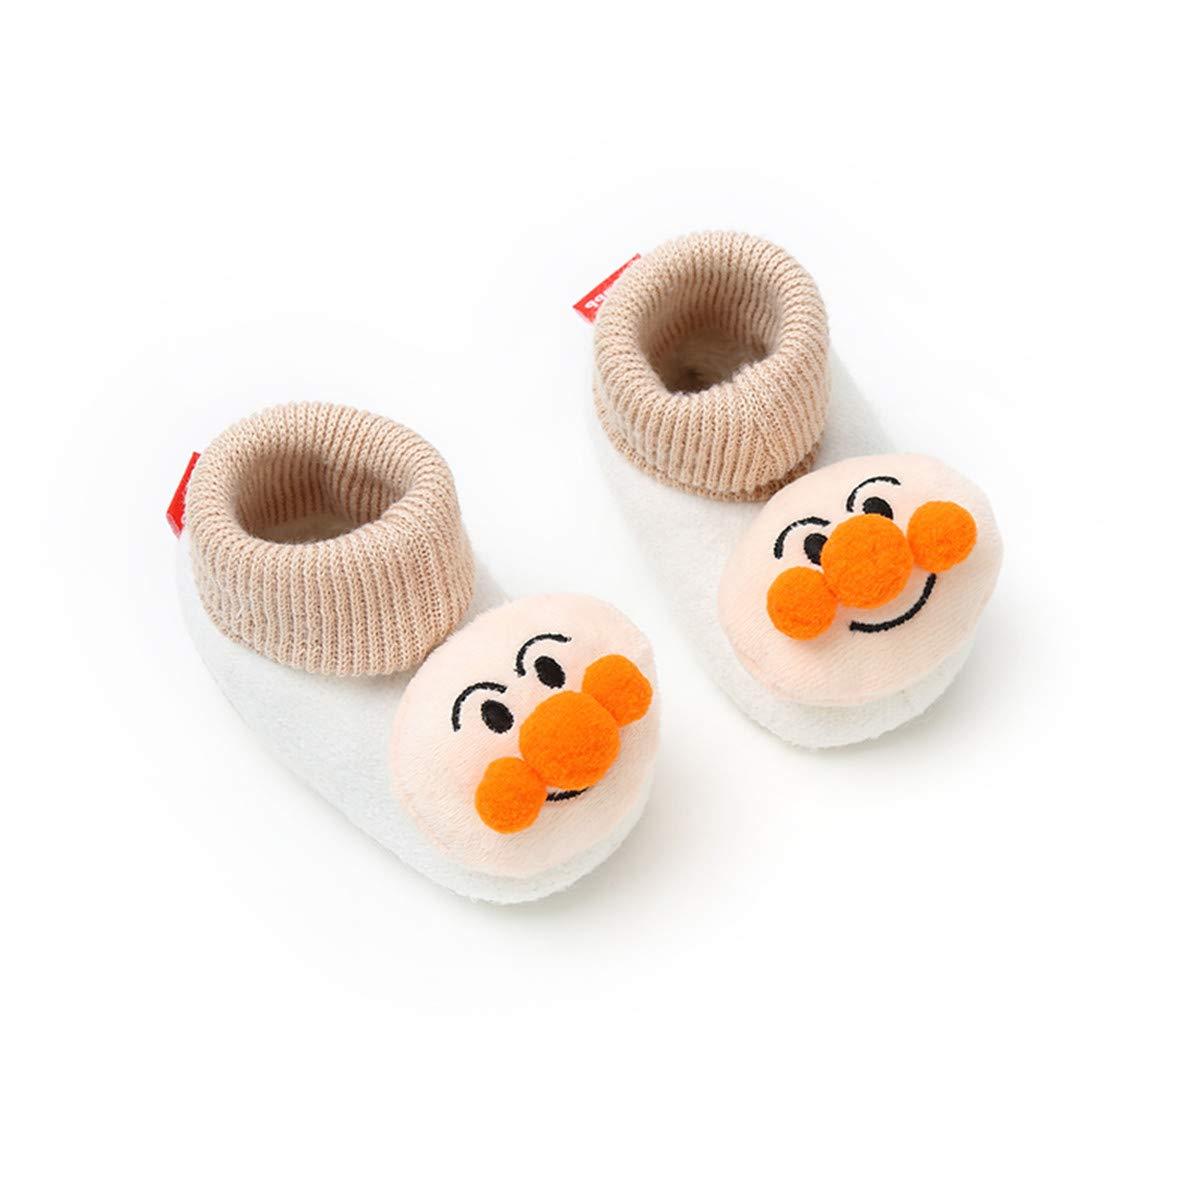 Sakuracan Baby Boys Girls Cozy Fleece Booties with Non-Slip Bottom Warm Winter Slippers Infant Crib Socks